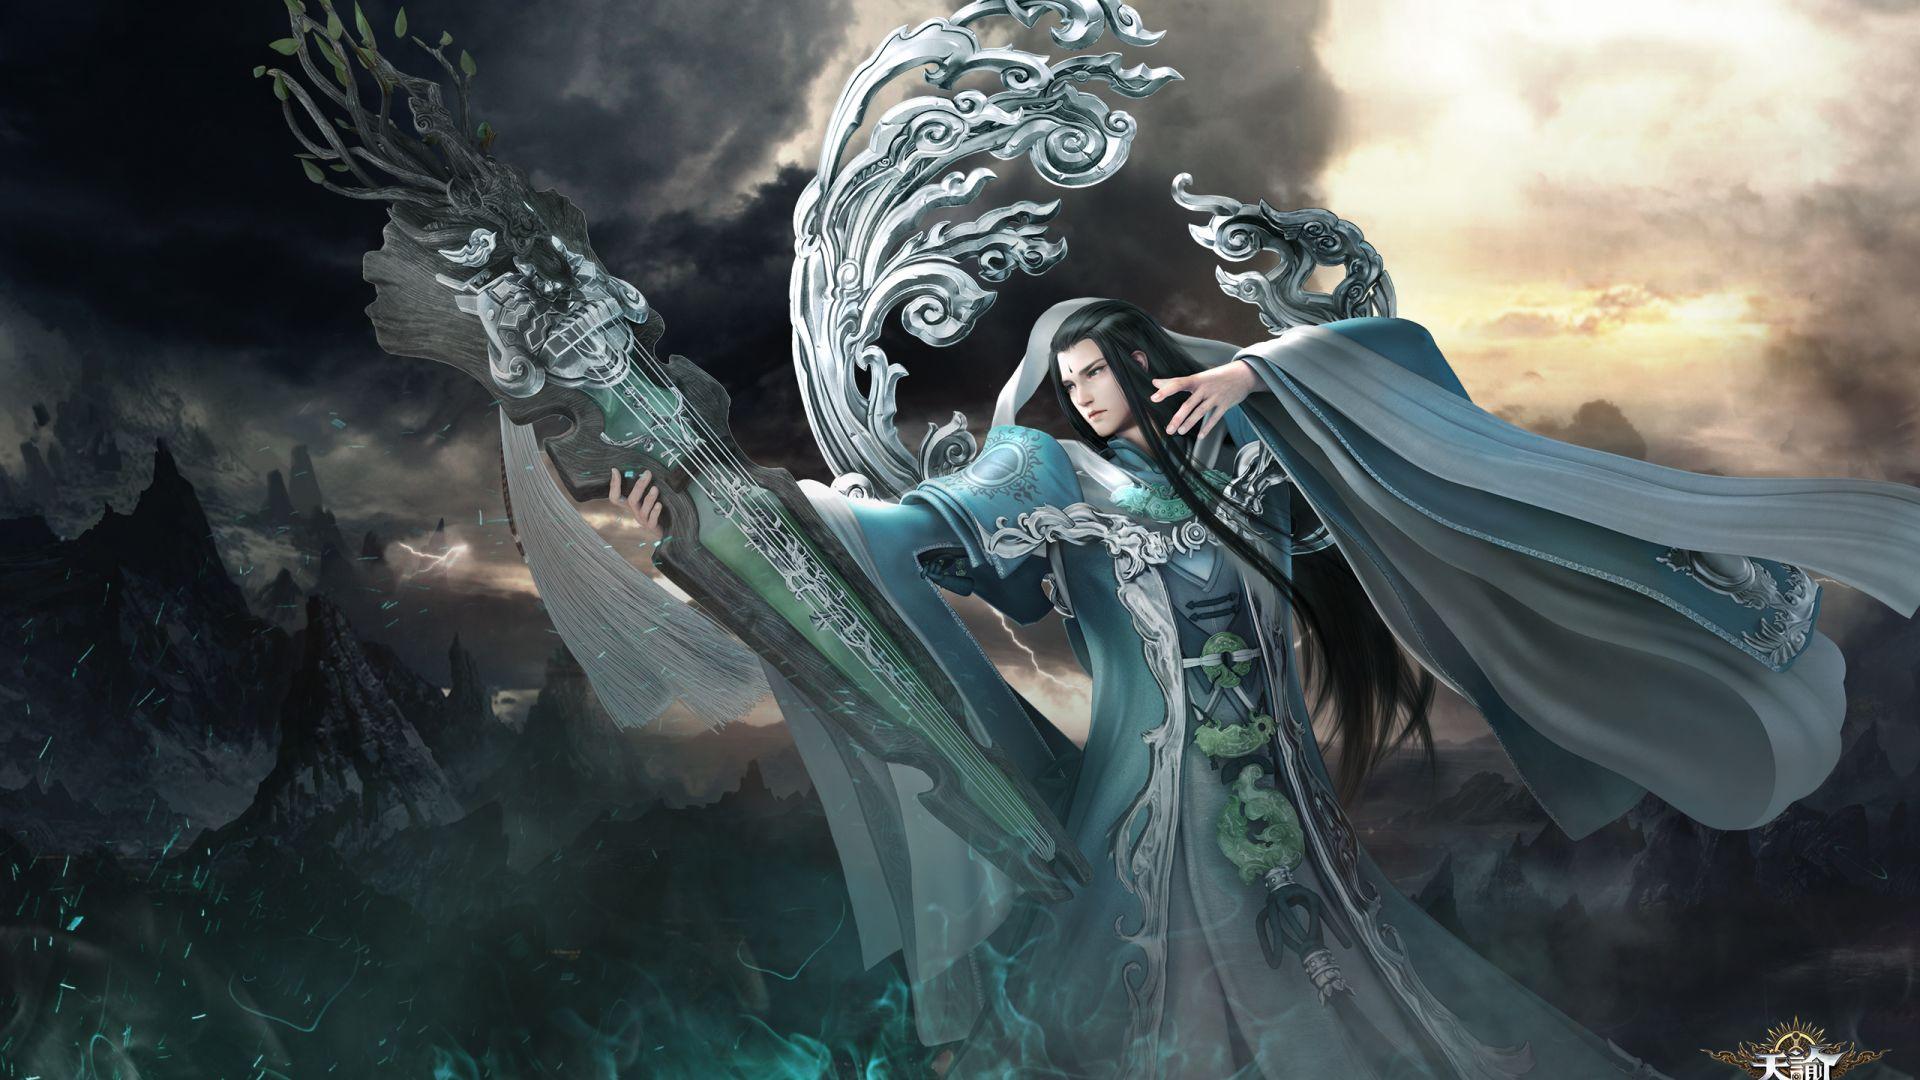 Chinese Dragon Wallpaper Hd Wallpaper Revelation Online Mmorpg Pc Games 13222